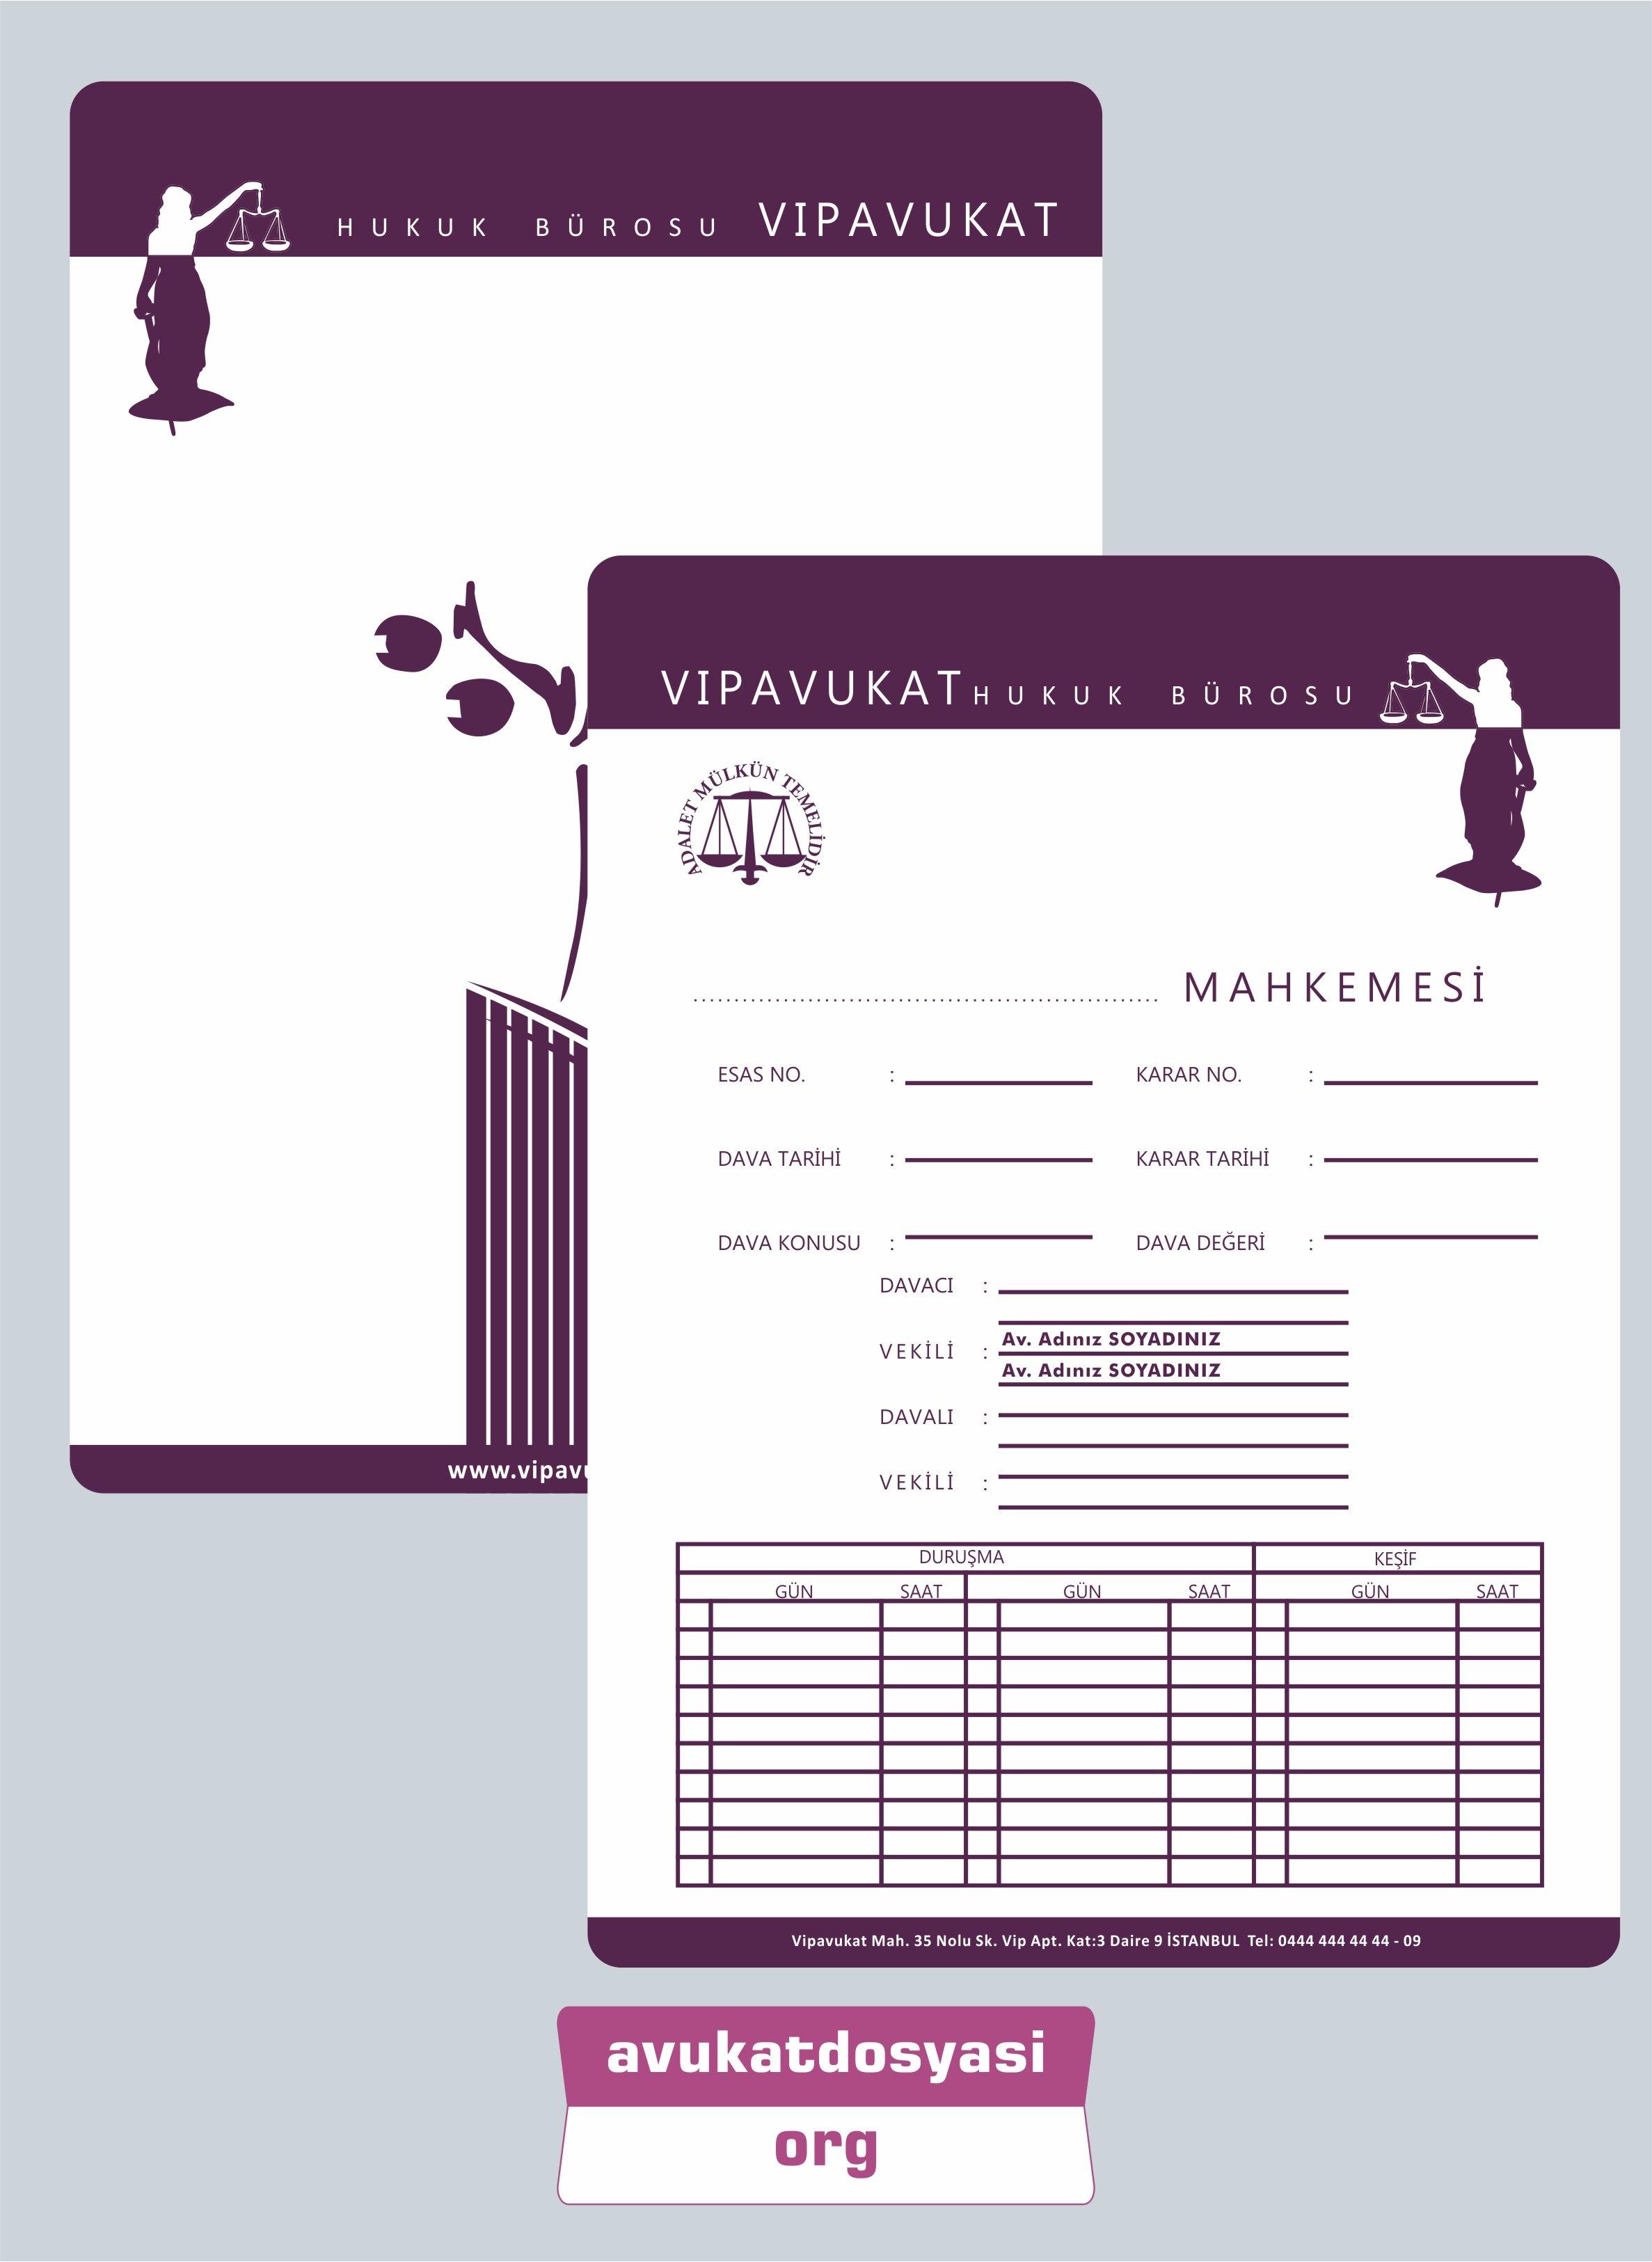 AVUKATDOSYASİ15 - avukatdosyasi15